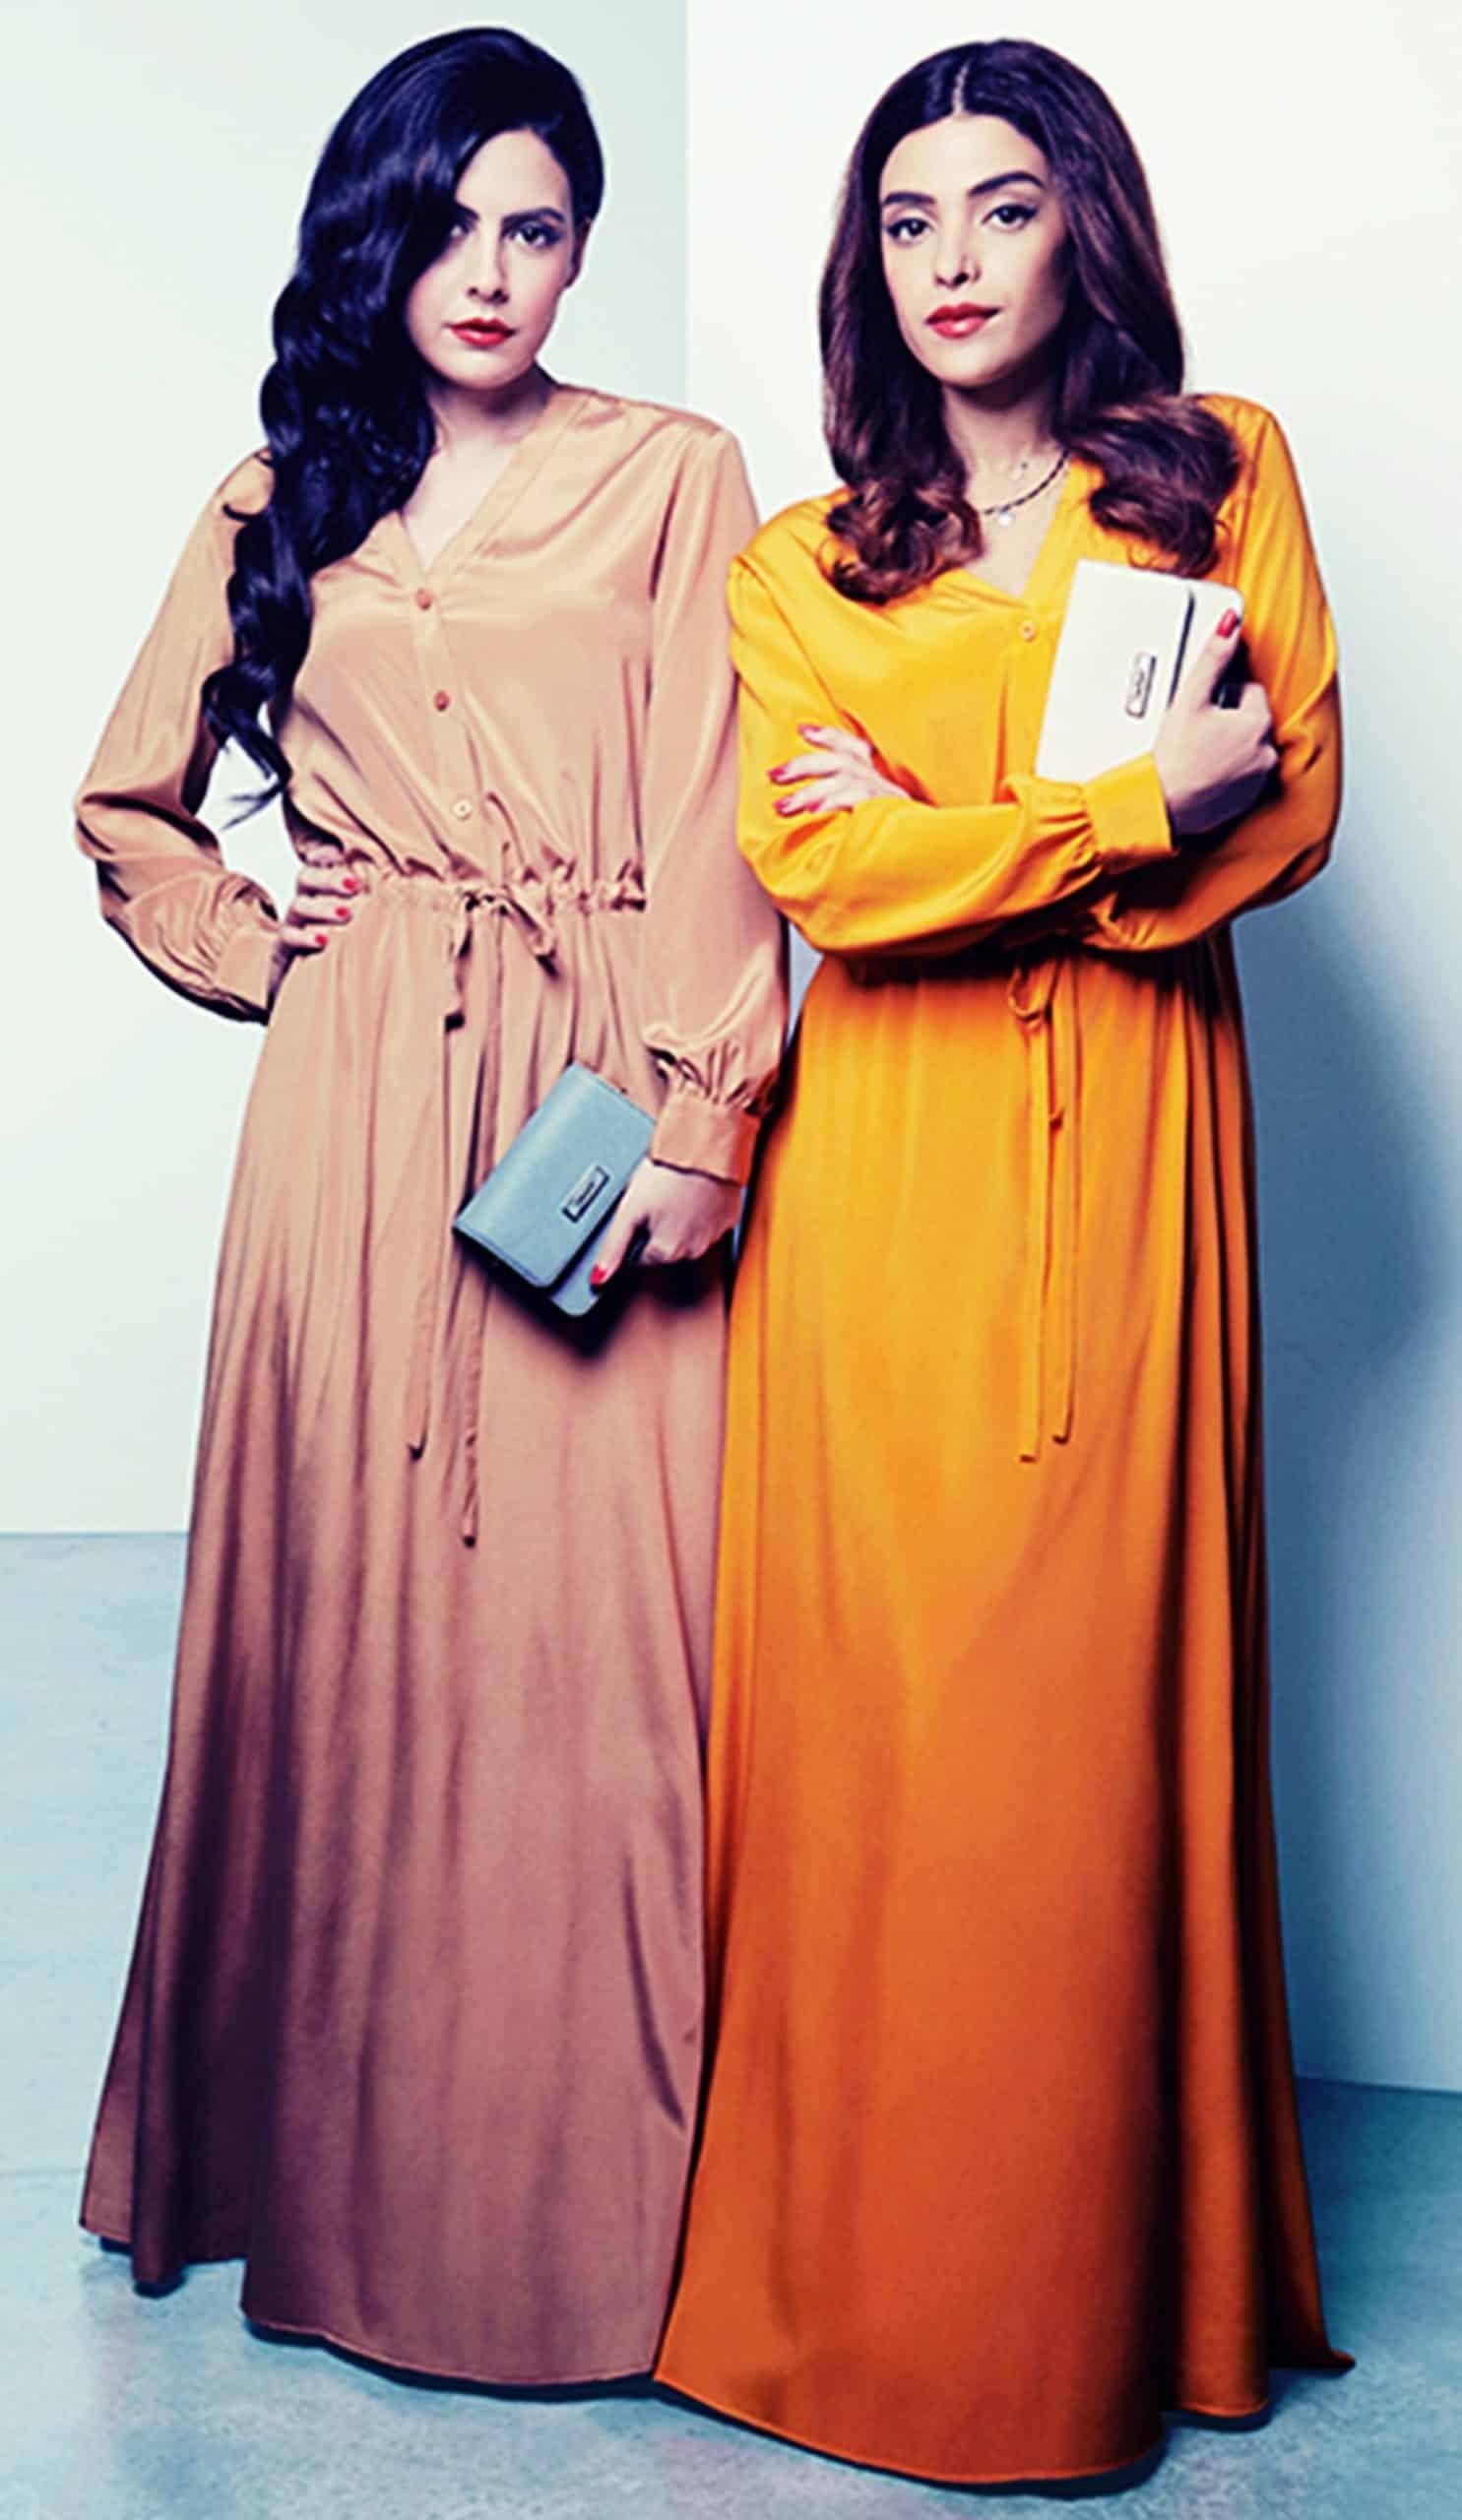 Coleção DKNY Ramadan